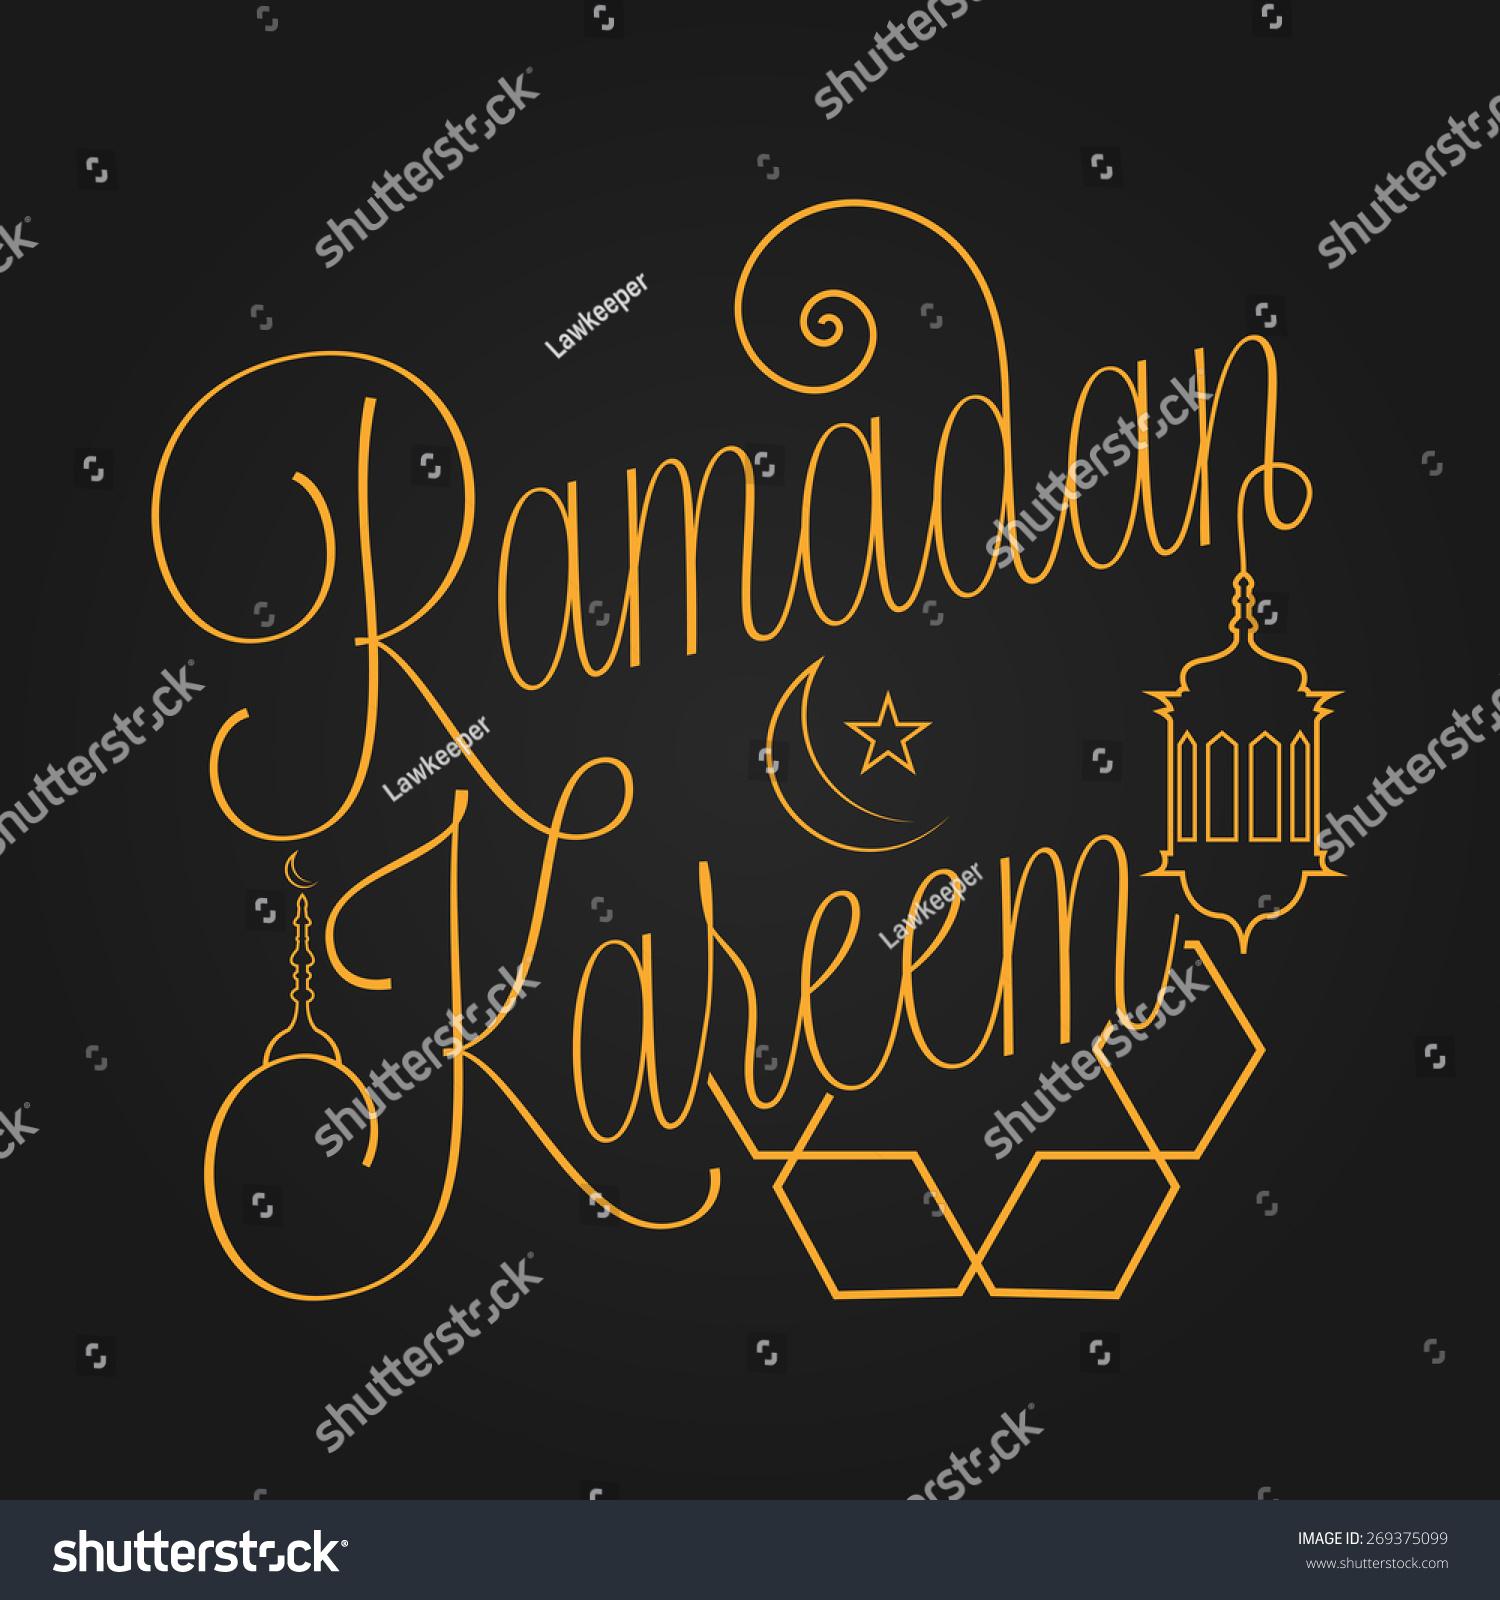 Ramadan Kareem Greeting Card Your Design Stock Vector Royalty Free